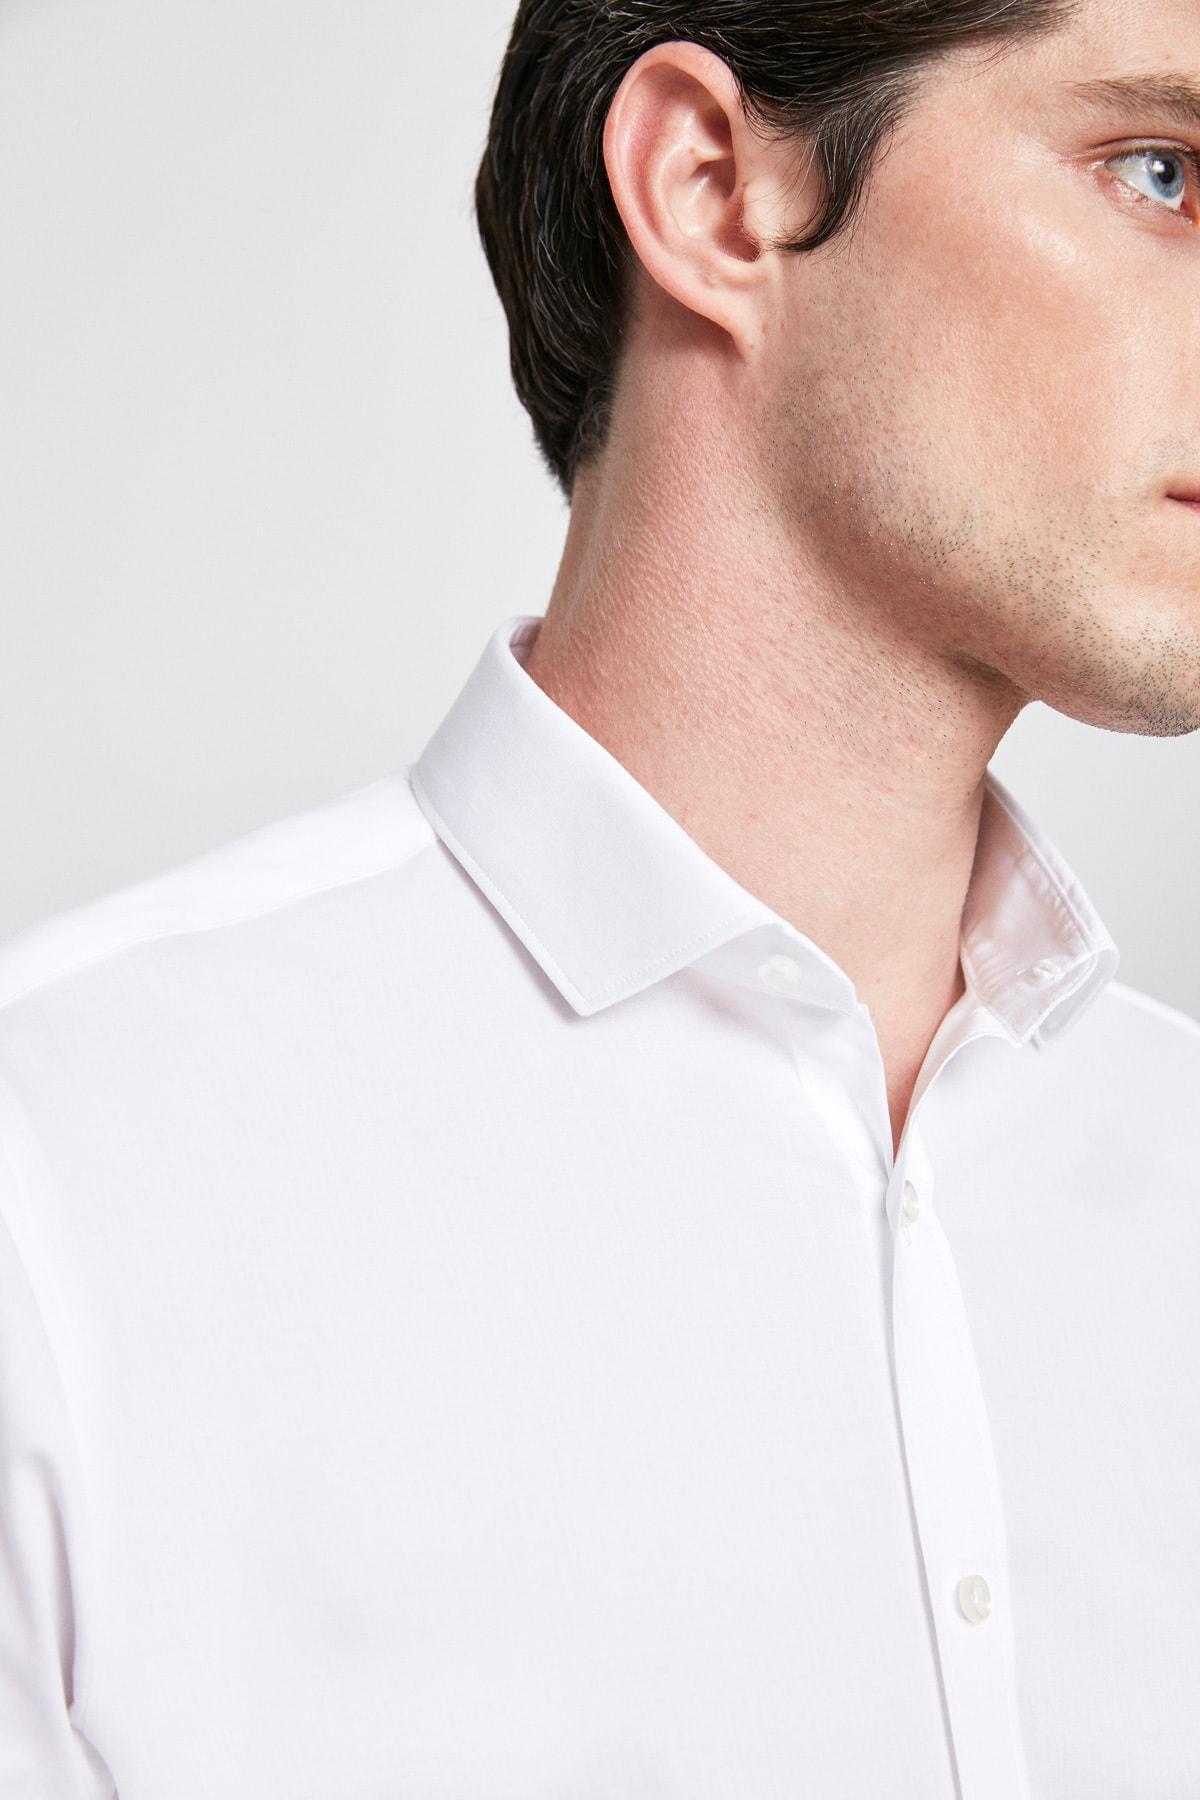 Twn Beyaz Renk Erkek  Gömlek (Slim Fit) 2